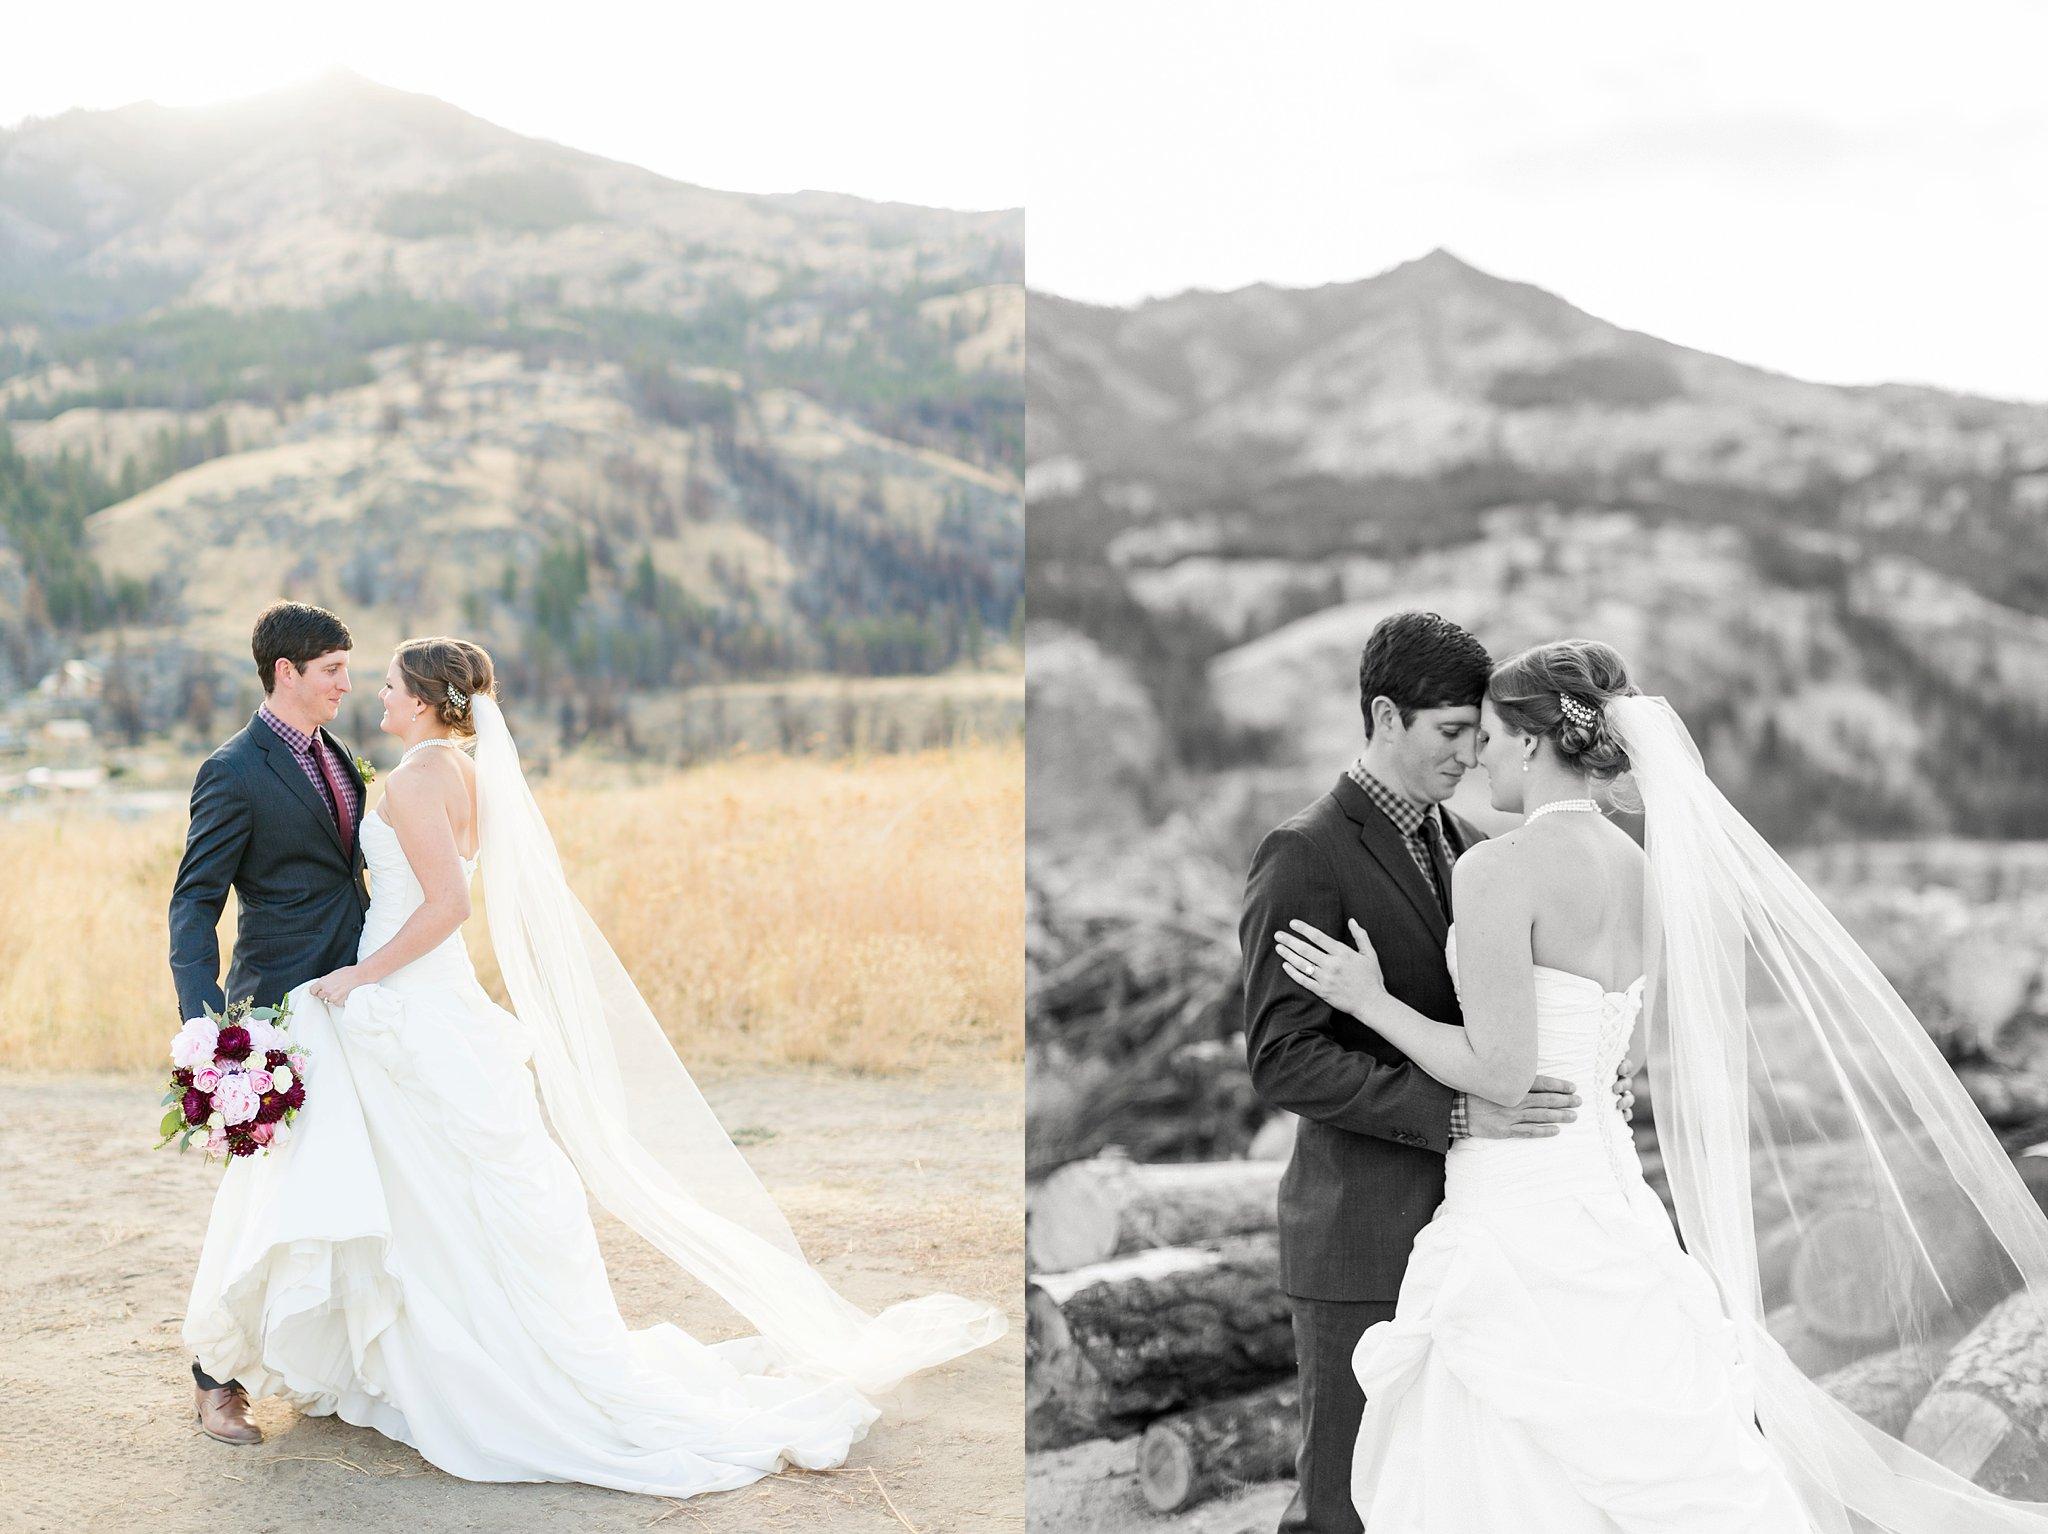 Chelan Washington Wedding Photos Megan Kelsey Photography Delight Wedding Workshop Styled Shoot Annalee & Scot-132.jpg